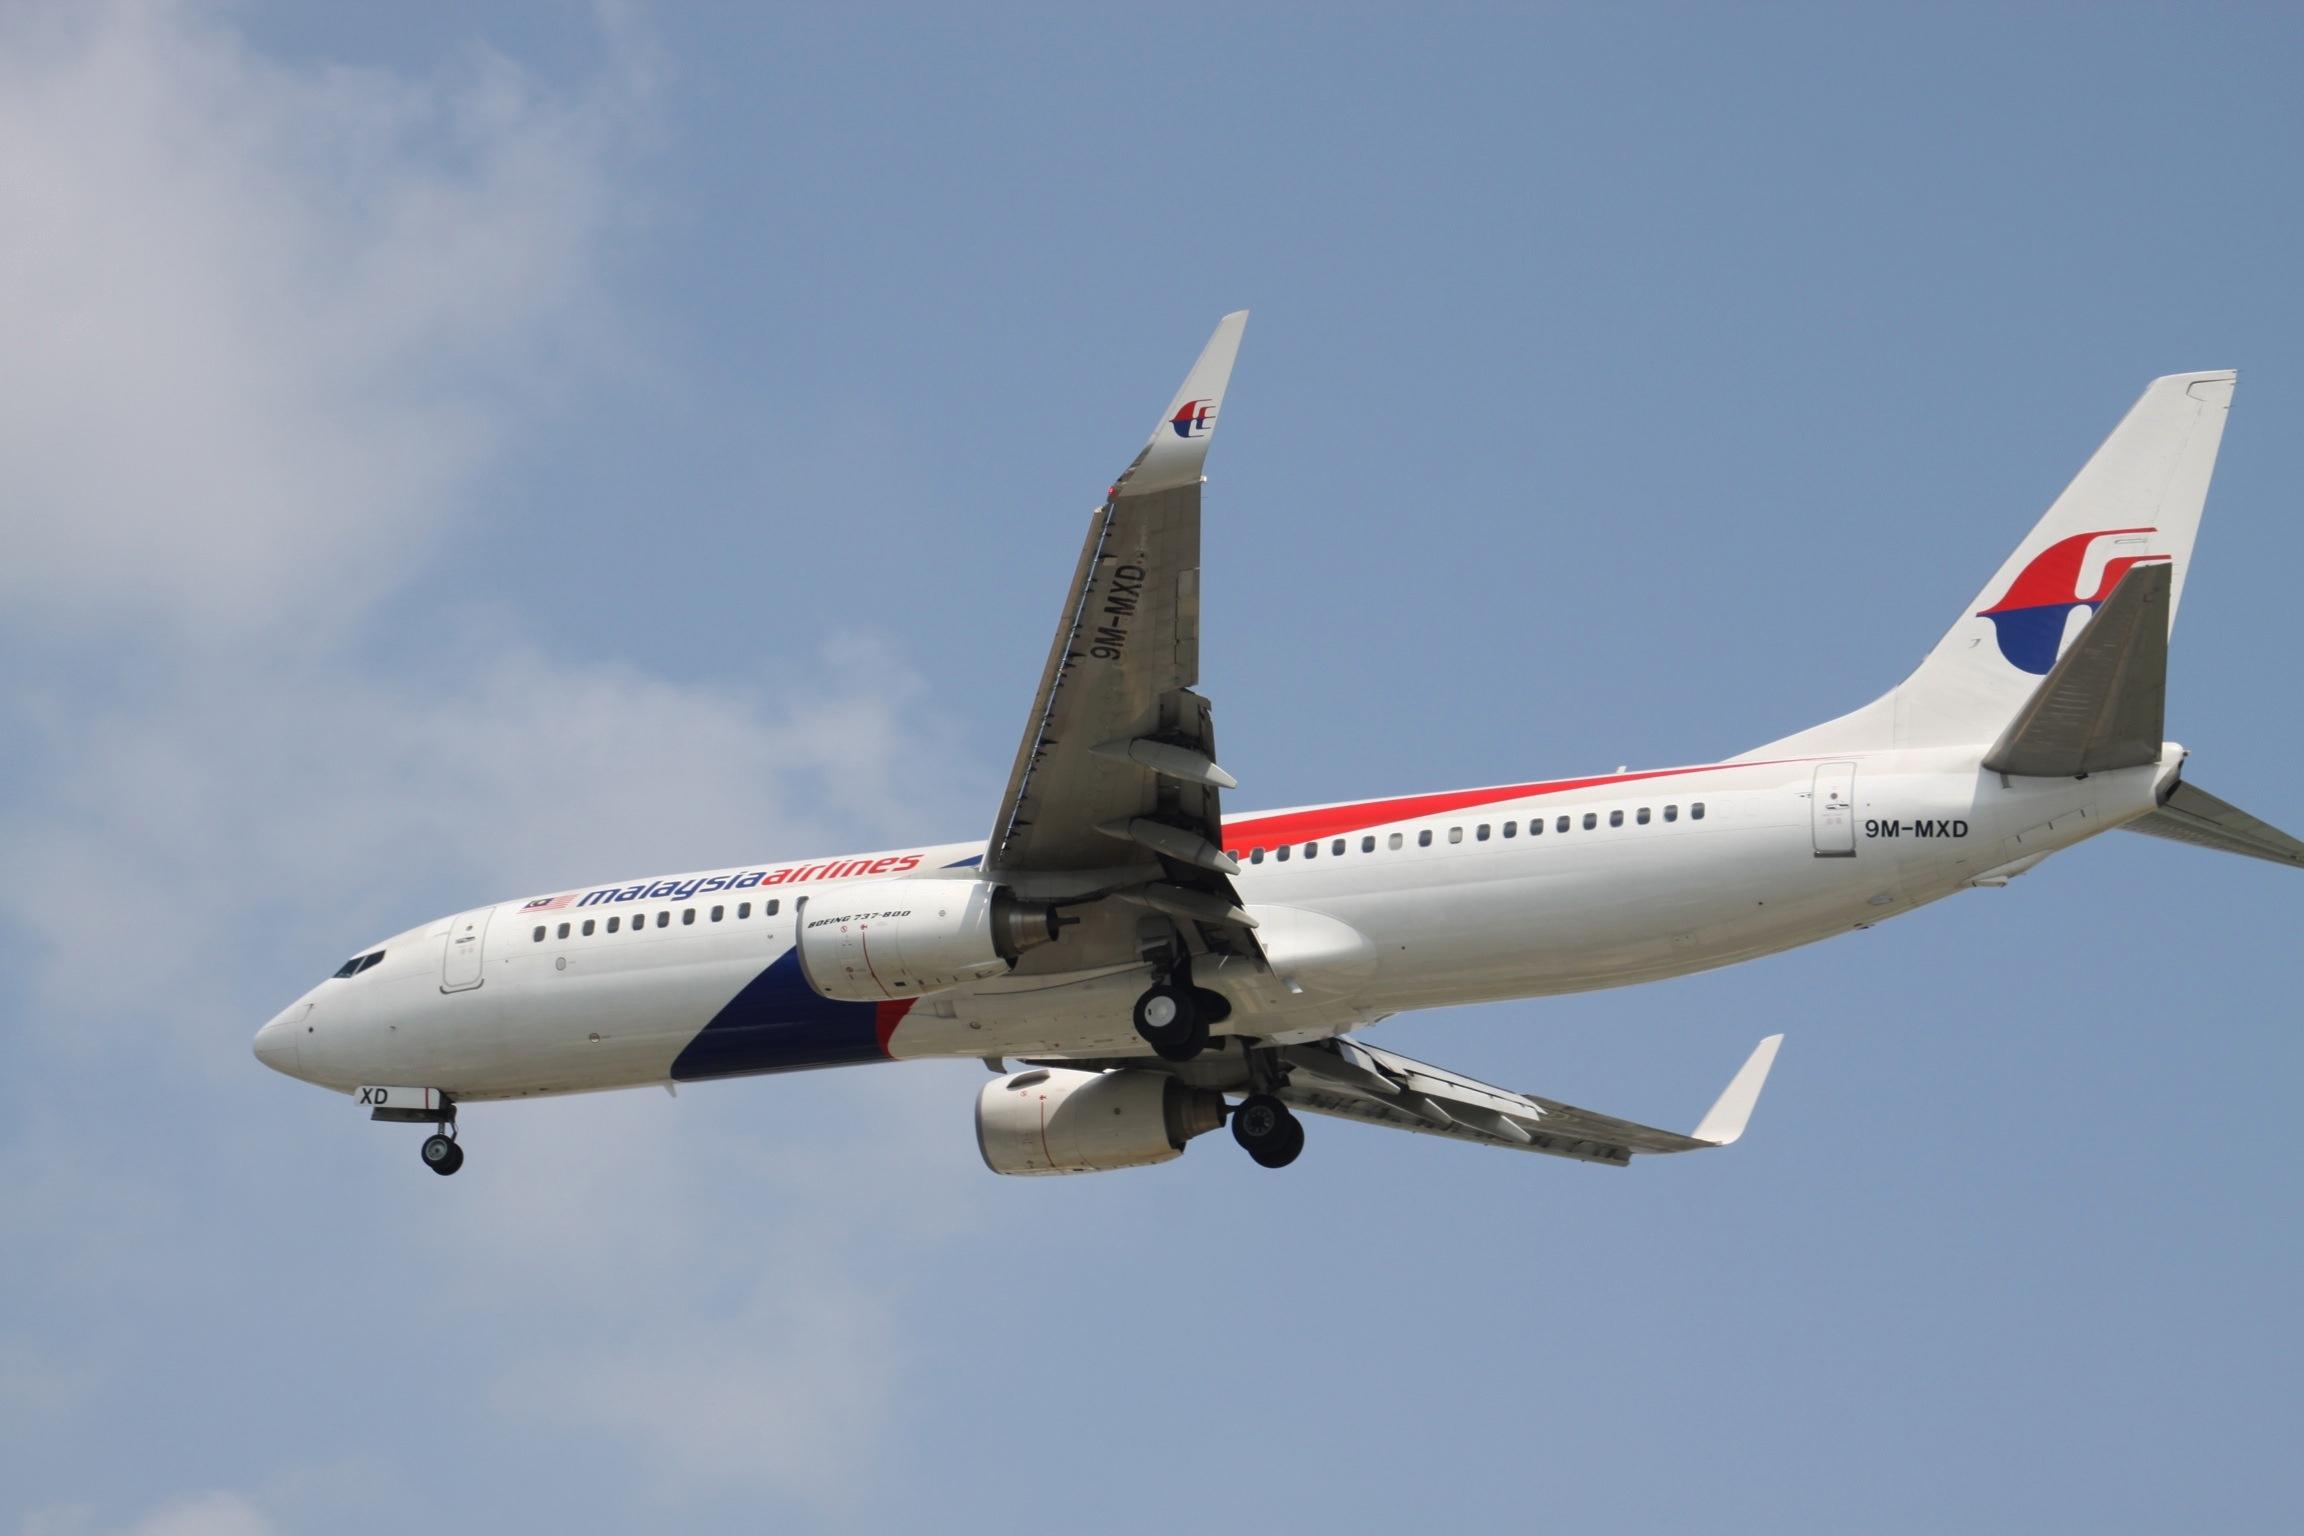 MH 738 (Aeroprintscom)